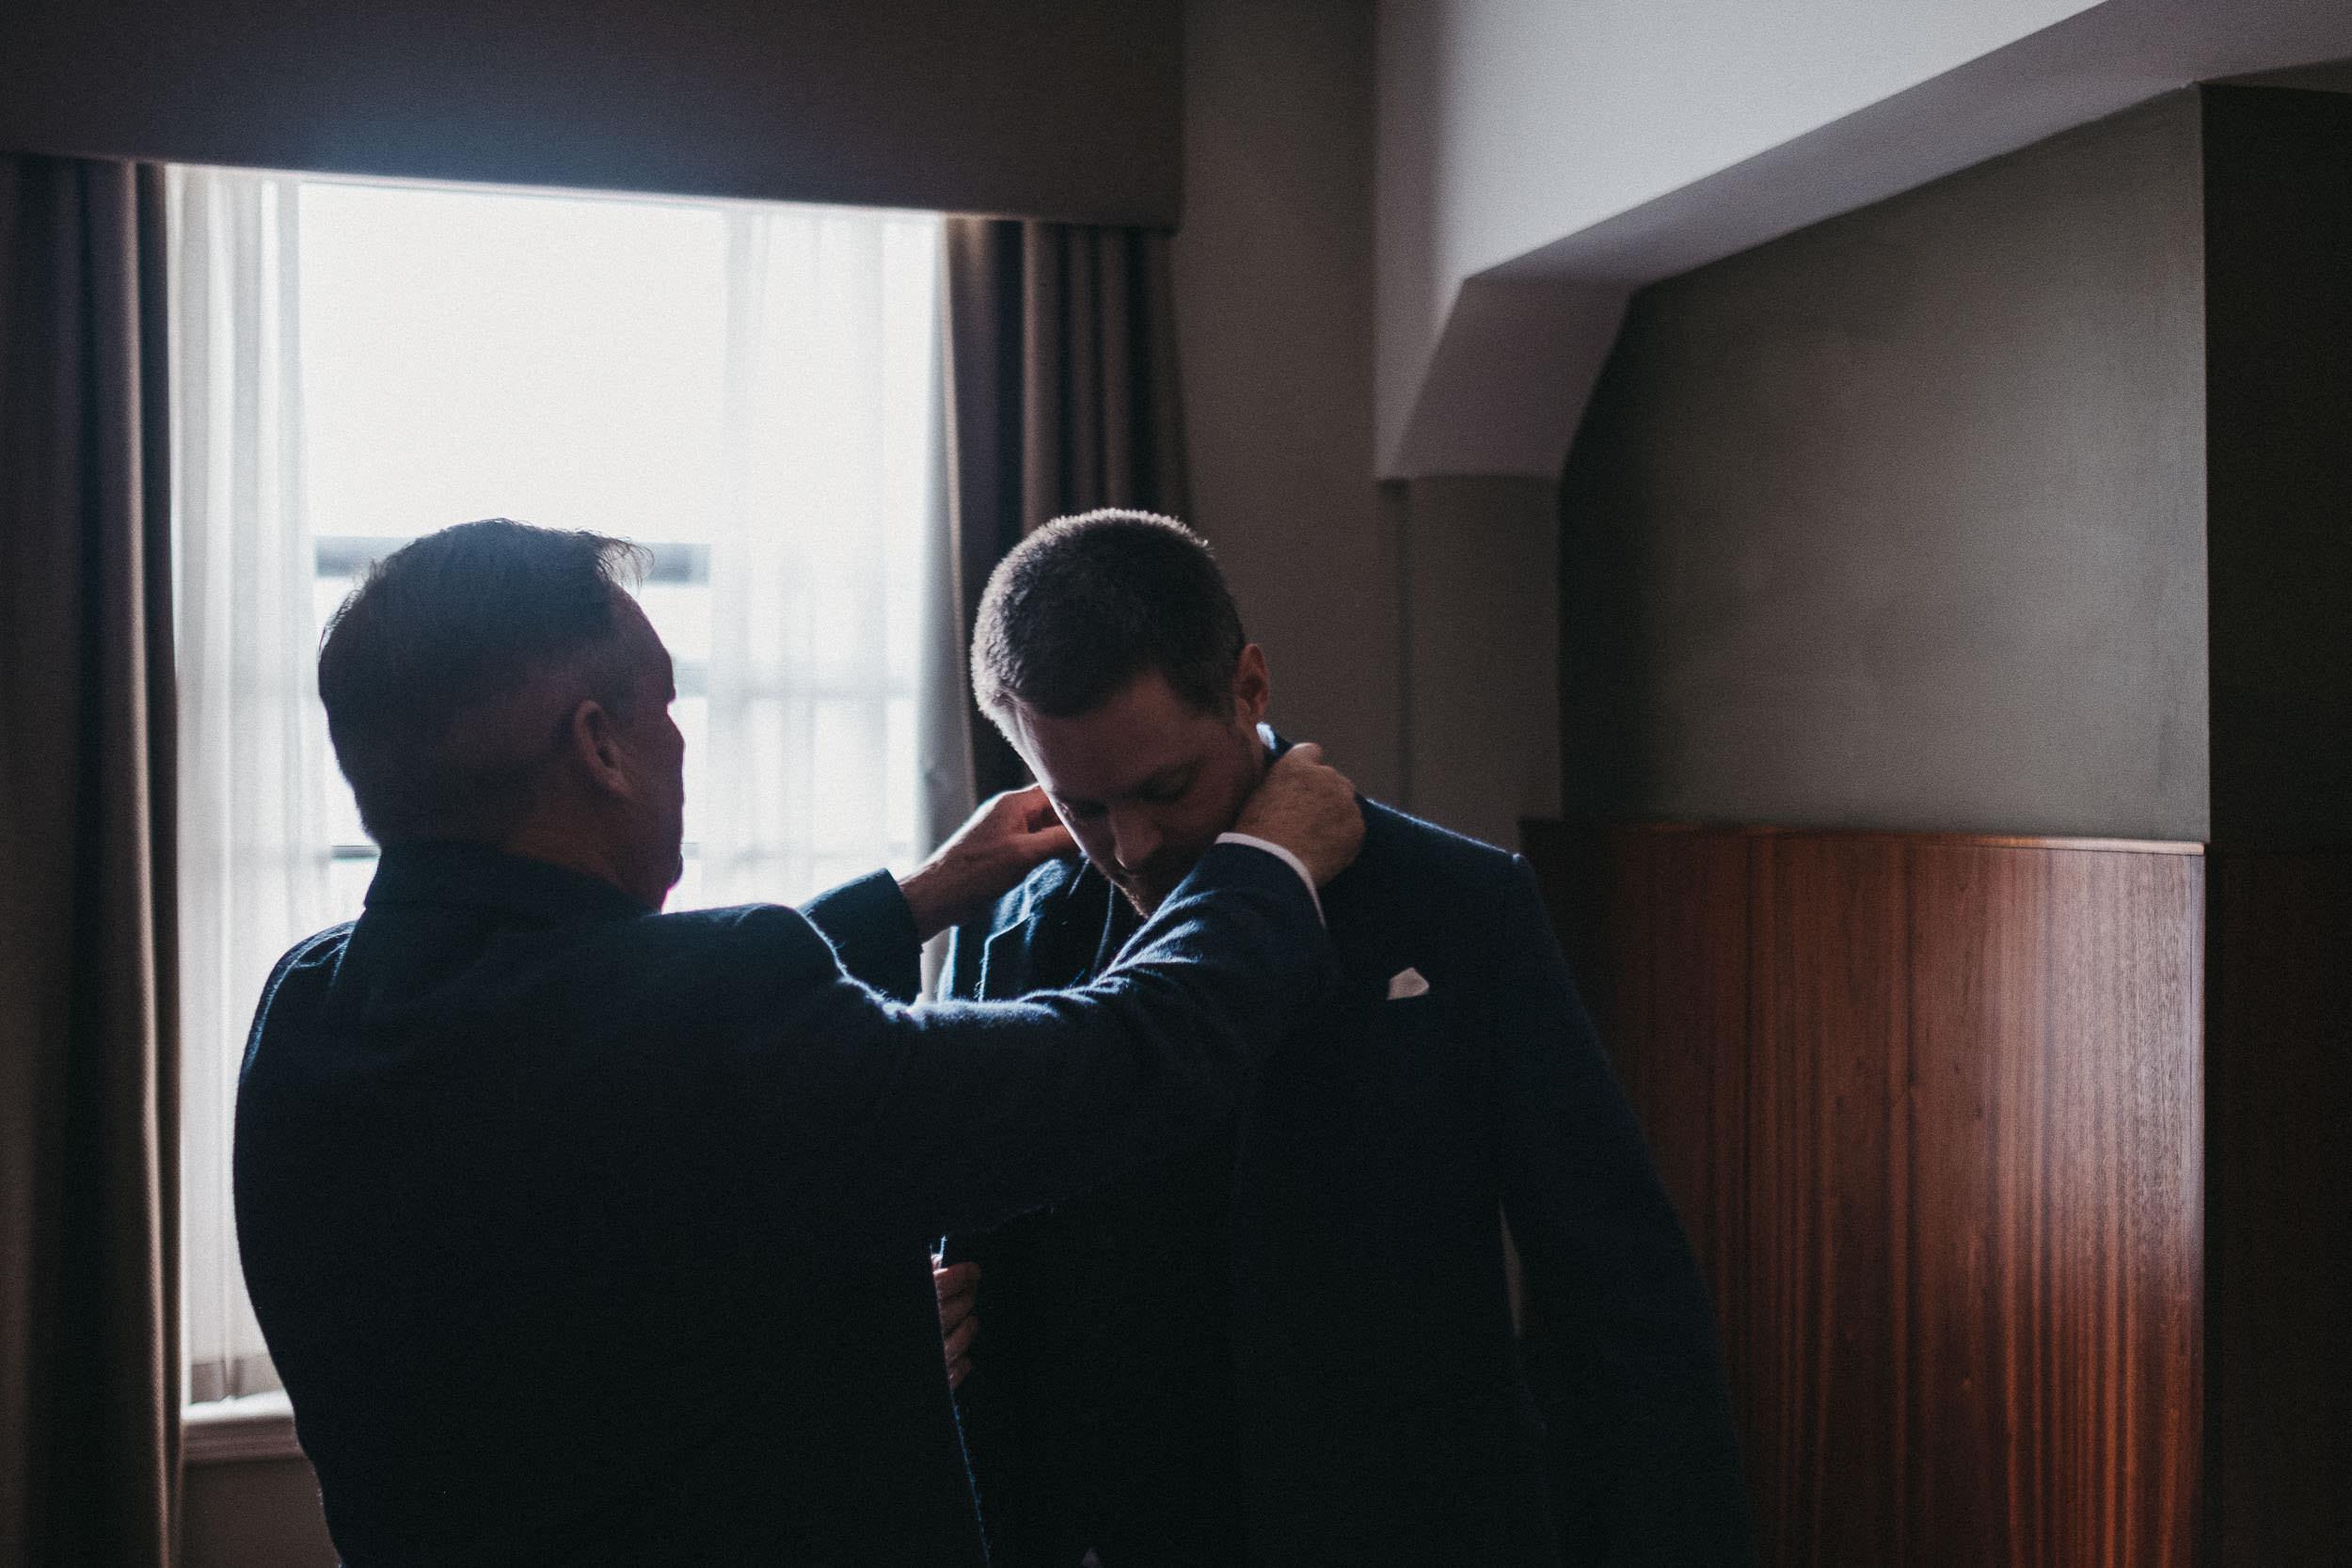 Father of groom adjusting groom's jacket